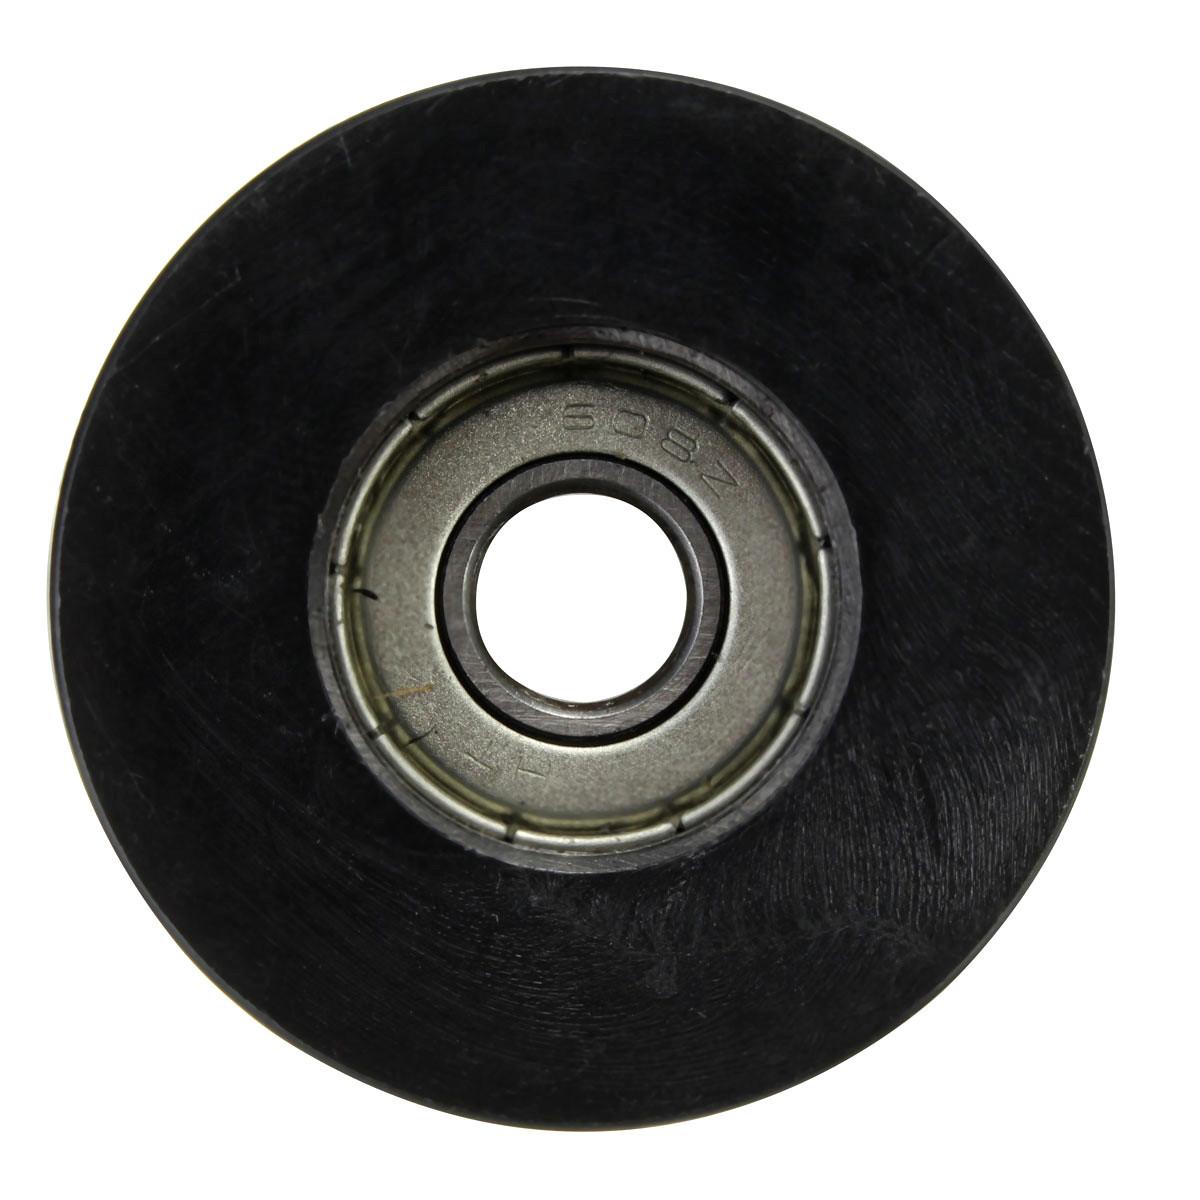 2Pcs 8mm U Trough Ball Bearing 0840UU Guide Pulley Sealed Rail Ball Bearing 8*40*20.7mm